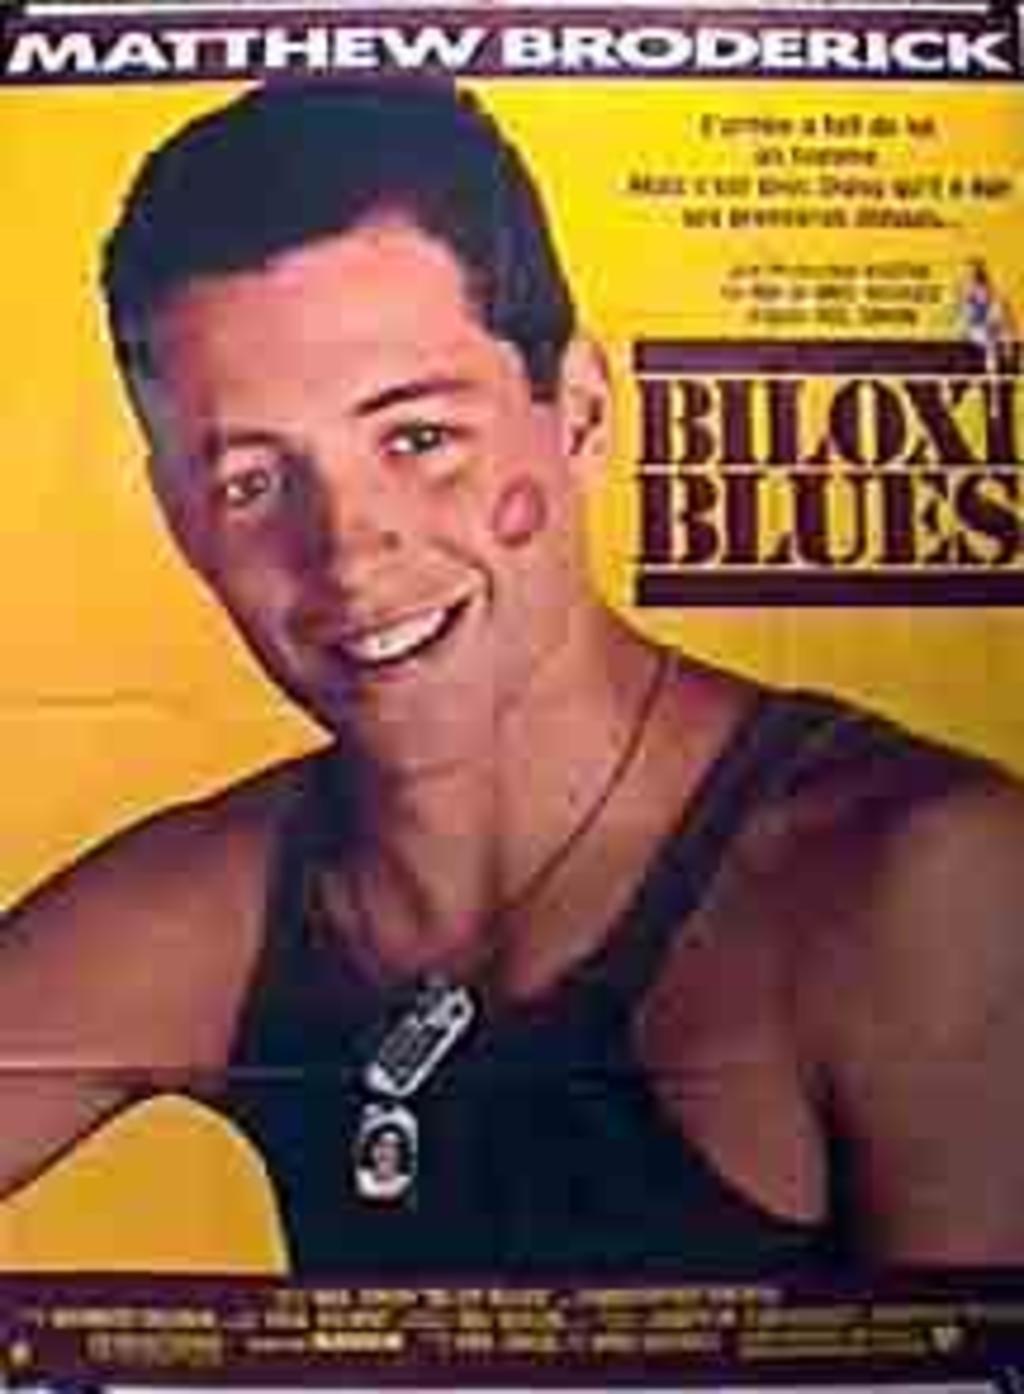 Watch Biloxi Blues On Netflix Today Netflixmovies Com